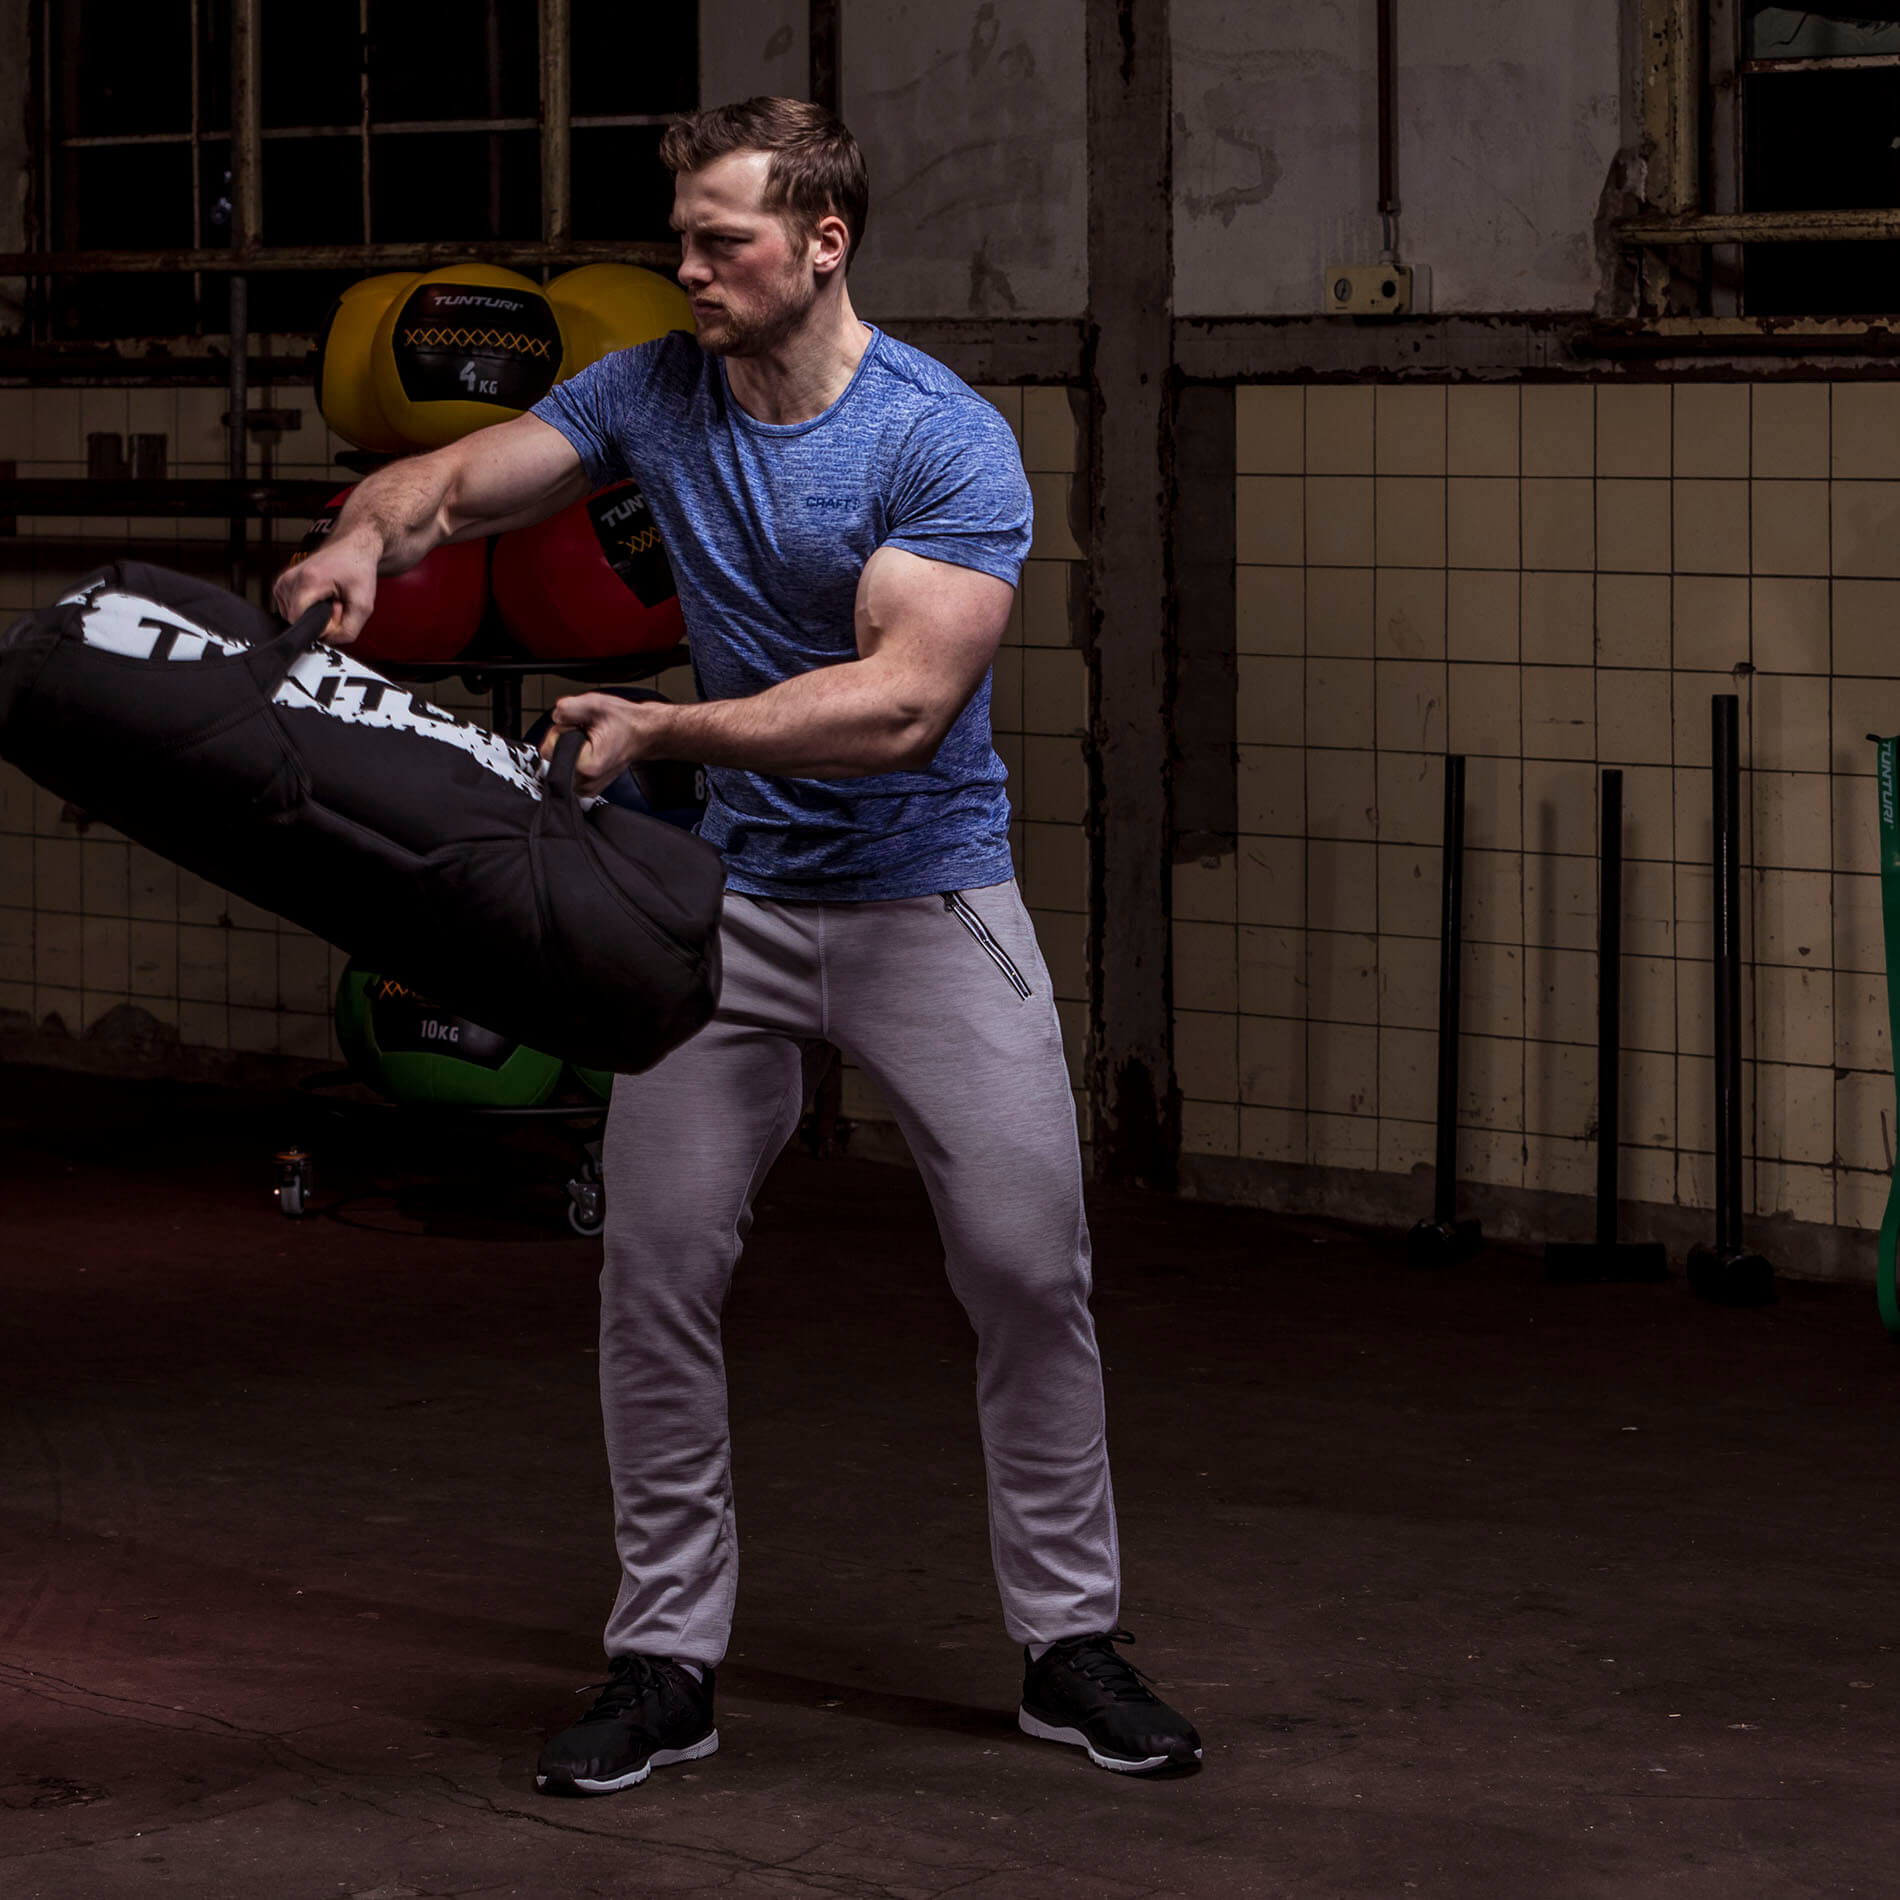 Pro strength sandbag - leeg